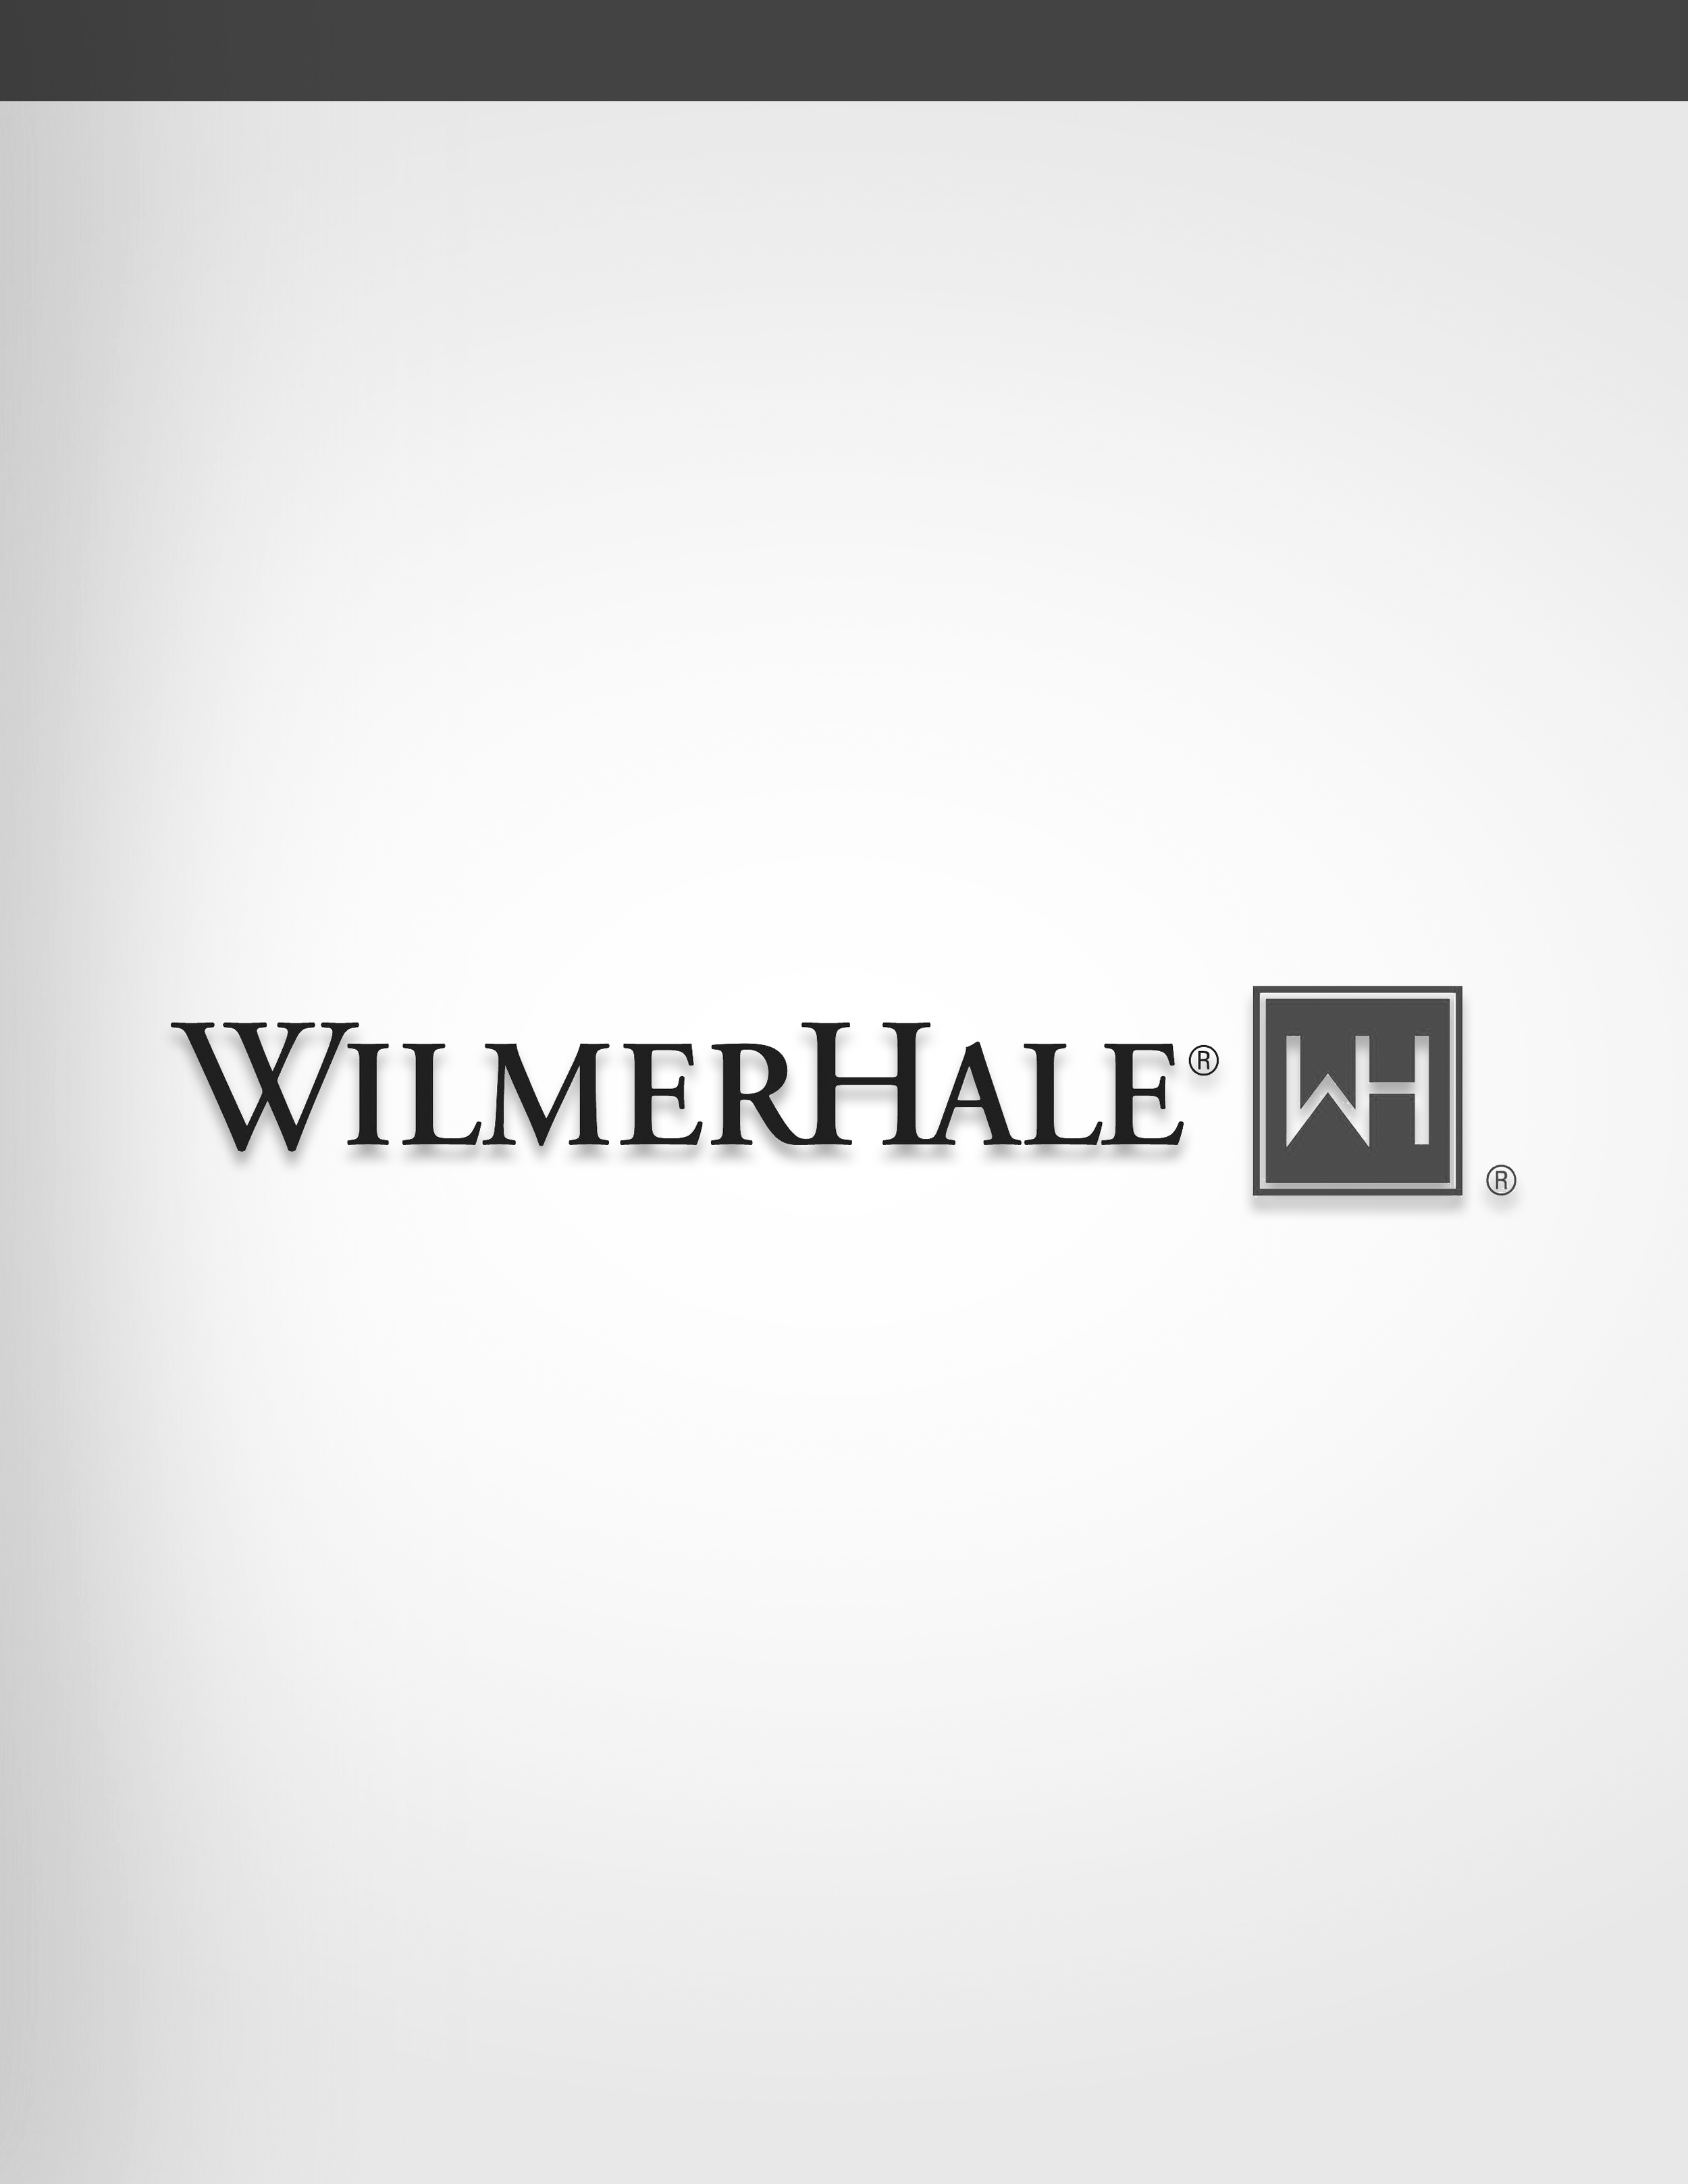 M&A Report  (WilmerHale)